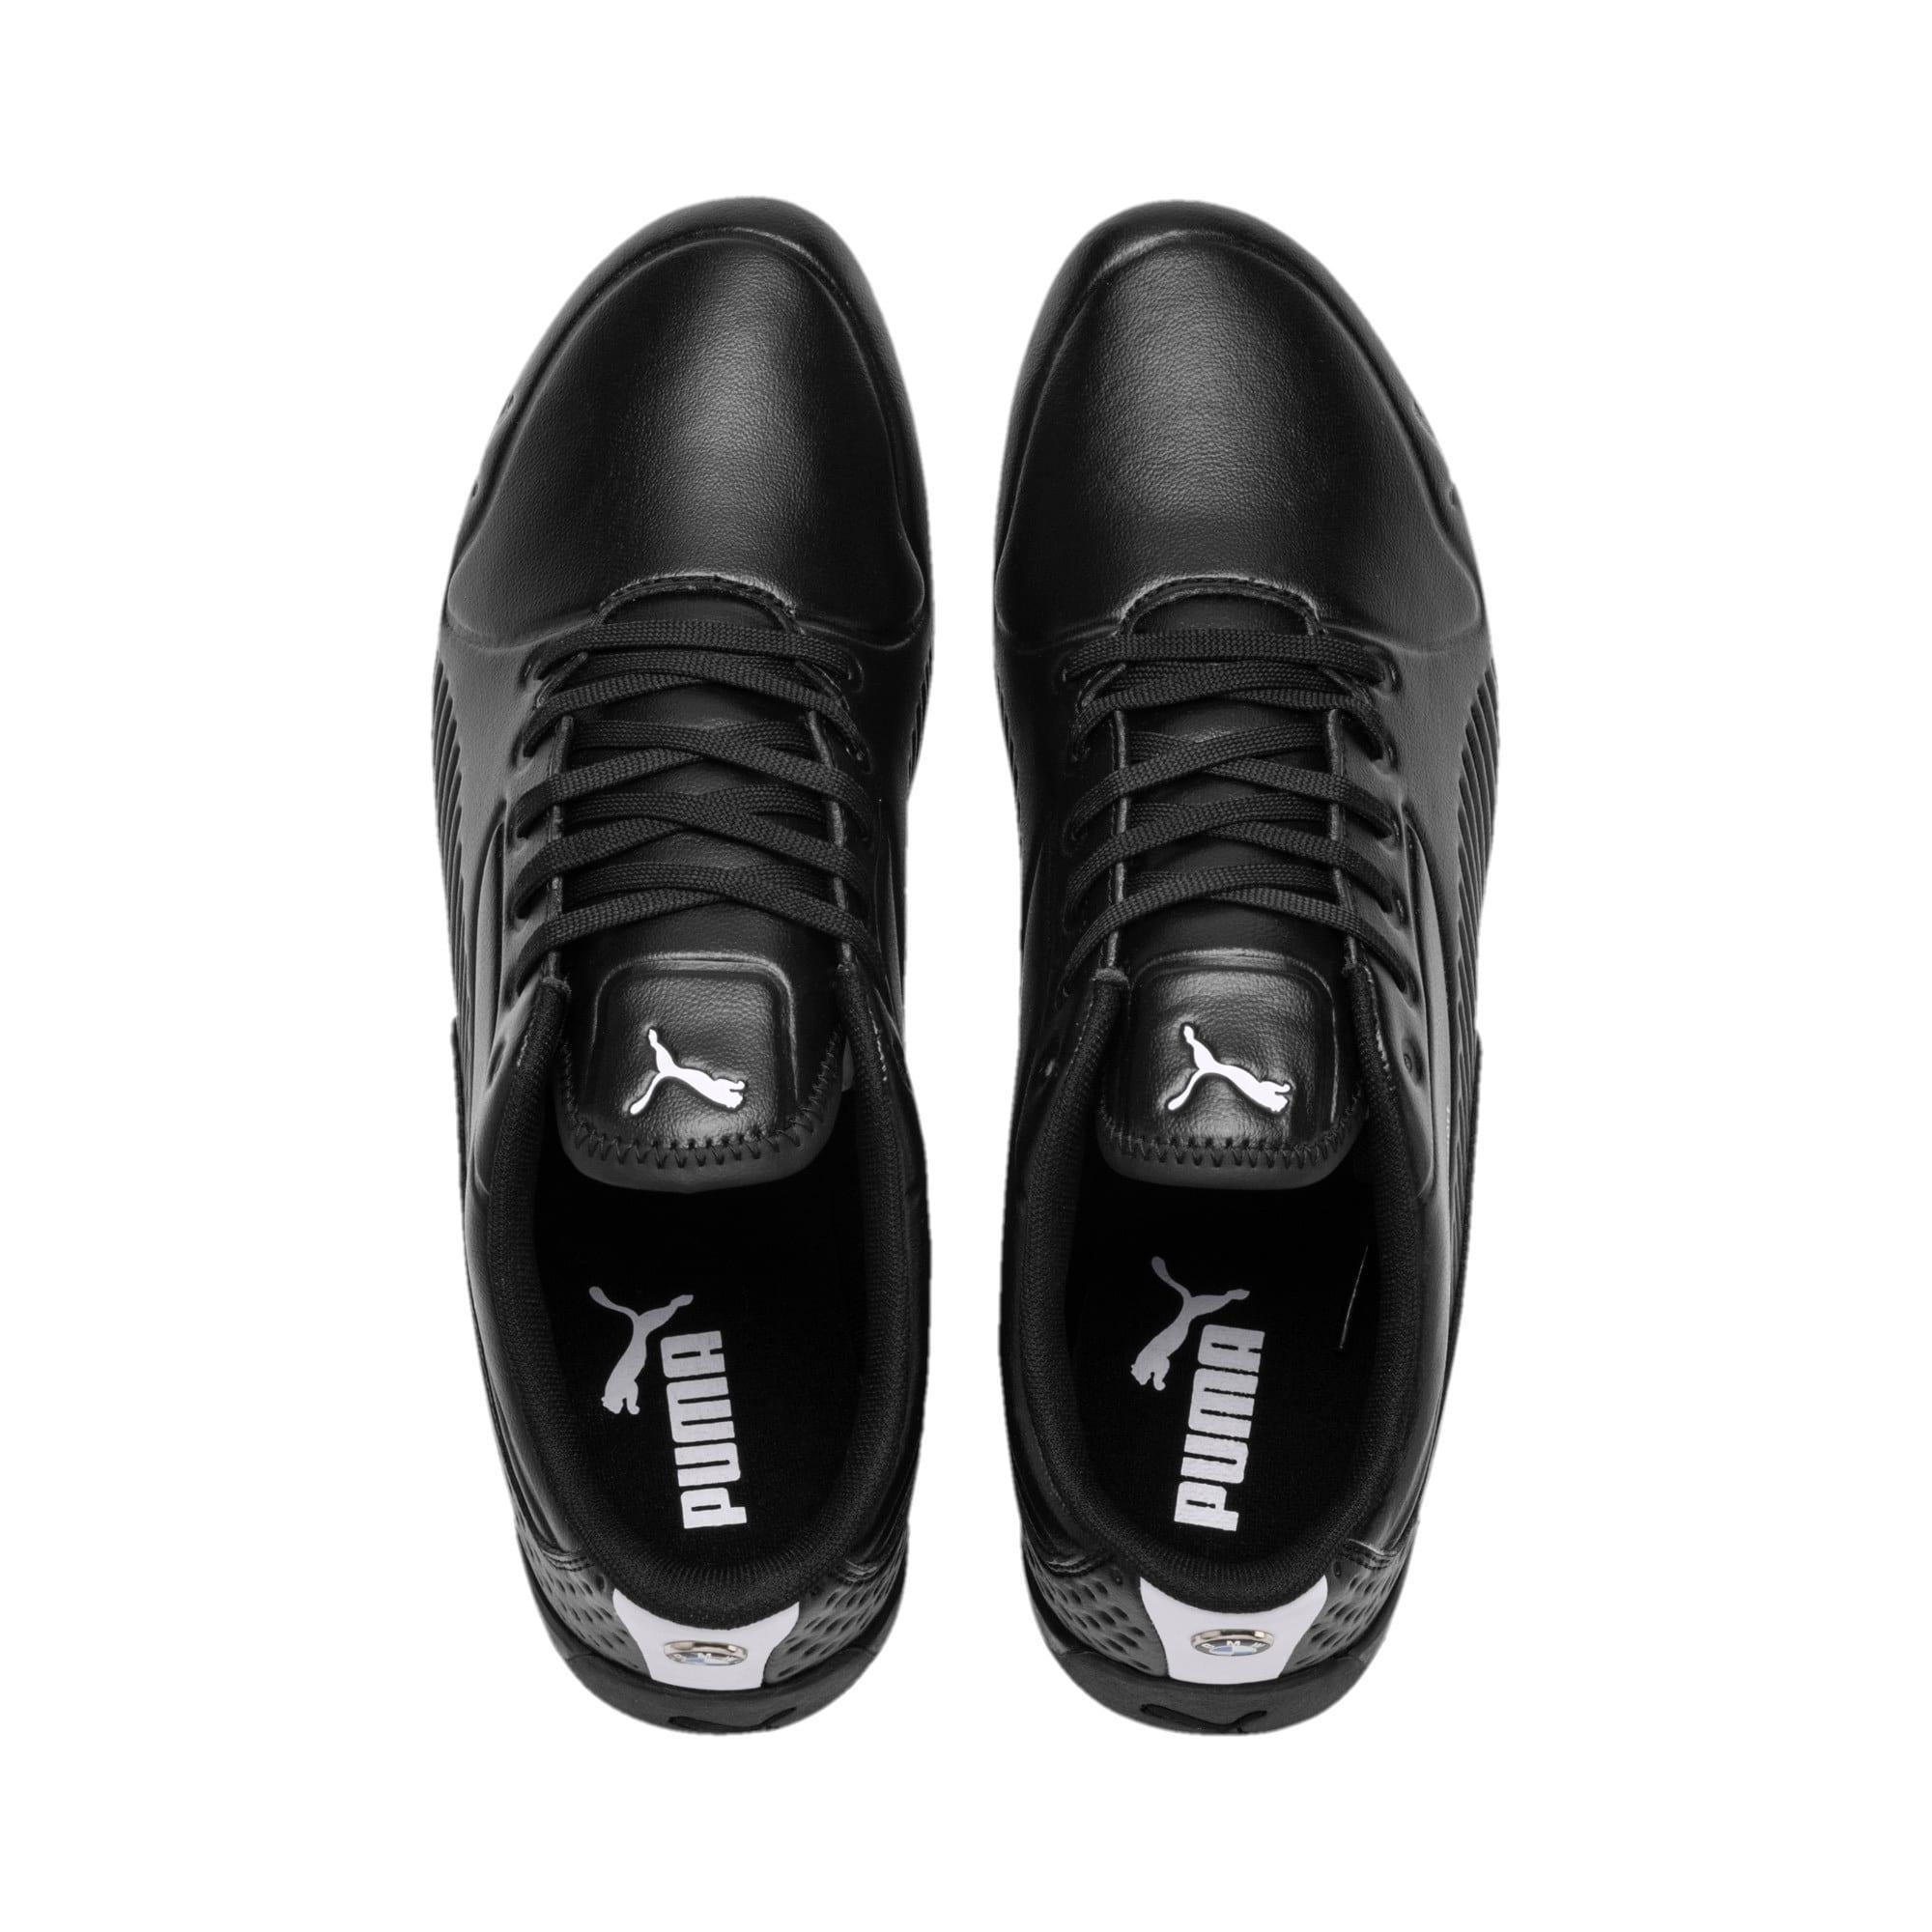 Thumbnail 7 of BMW M Motorsport Drift Cat 7S Ultra Shoes, Puma Black-Puma White, medium